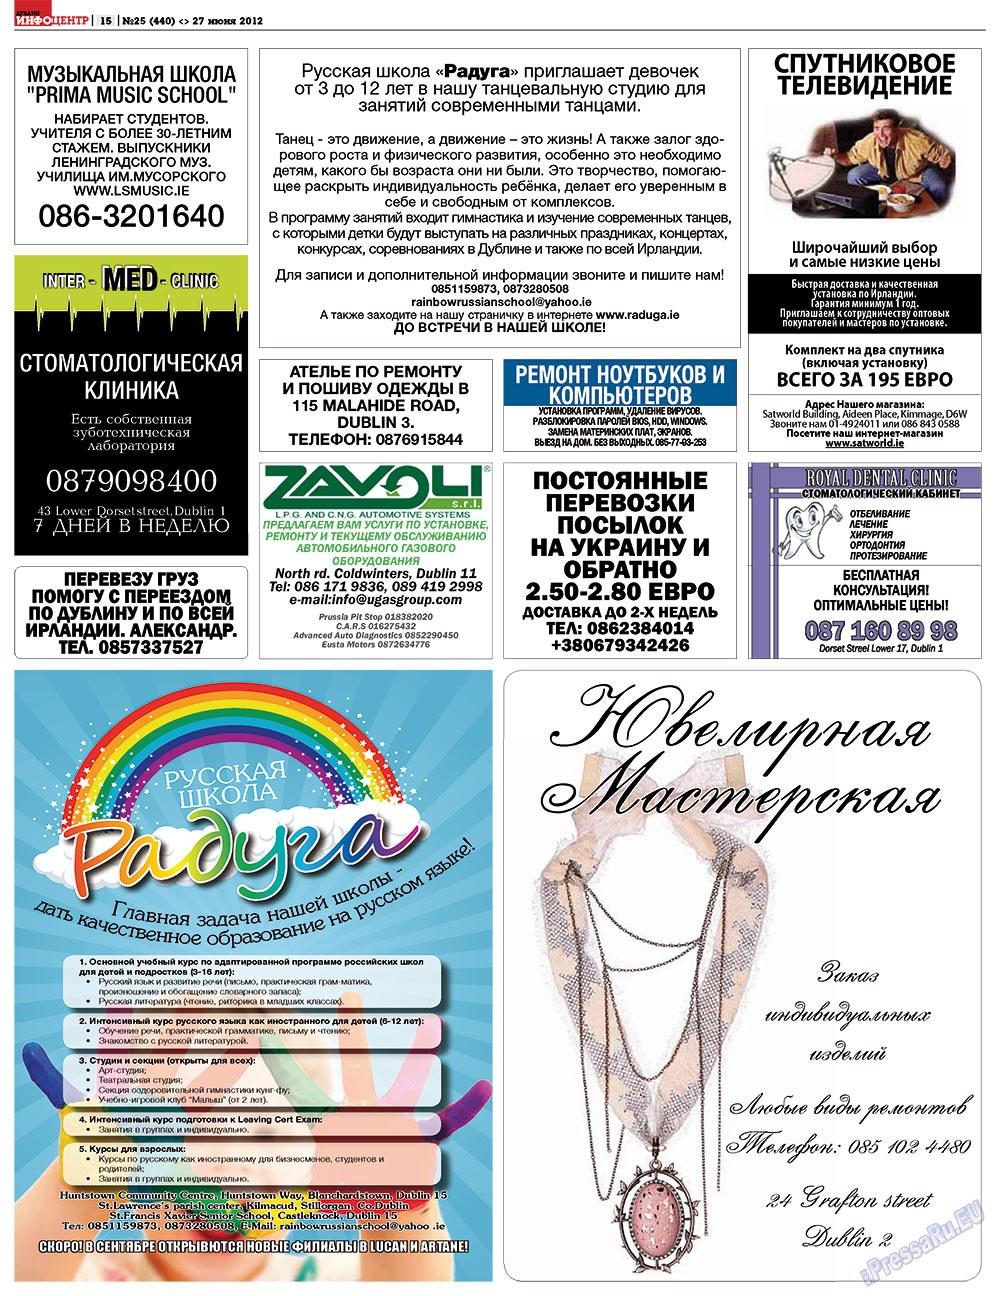 Дублин инфоцентр (газета). 2012 год, номер 25, стр. 15